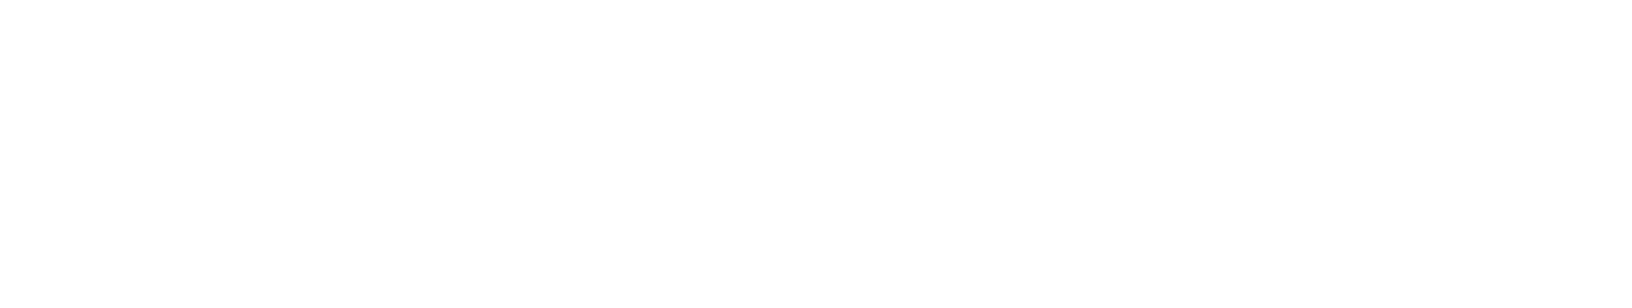 CAPA RESIDENCIAL-02